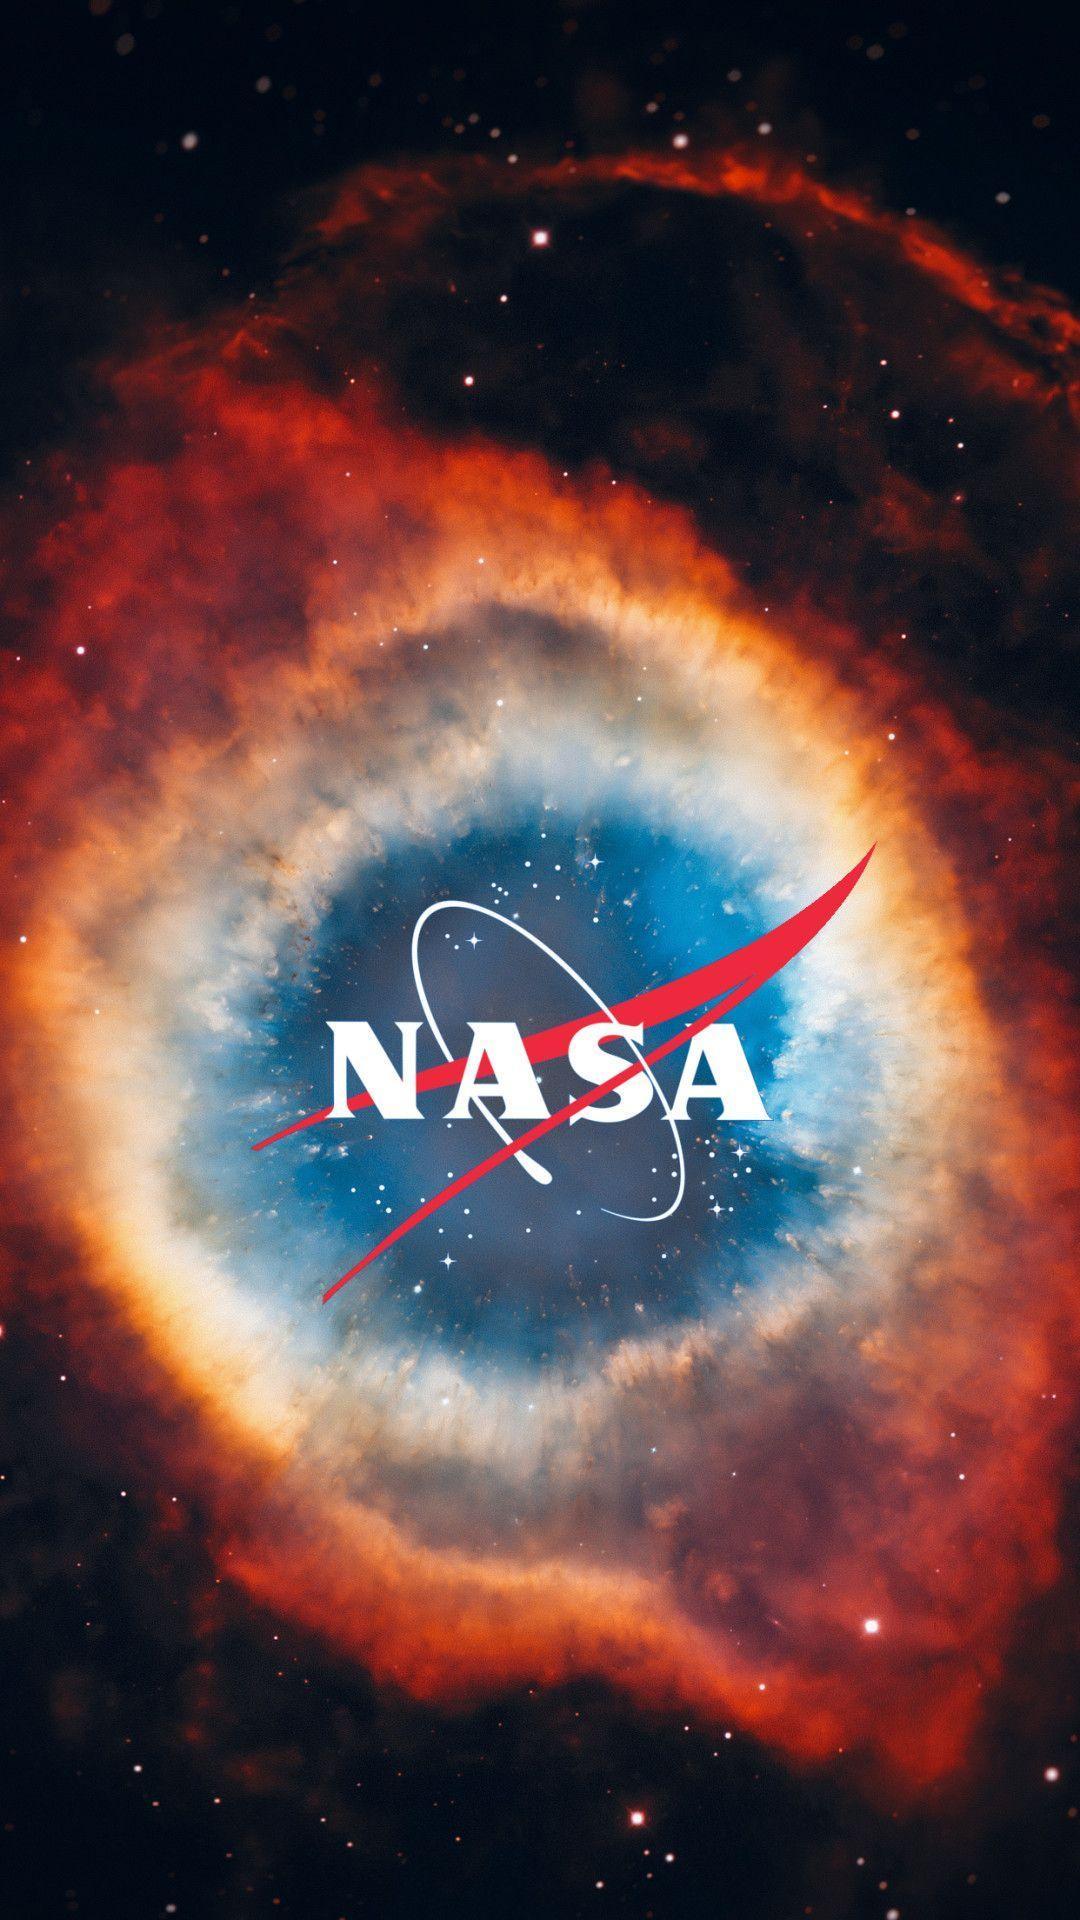 NASA Logo IPhone Wallpapers